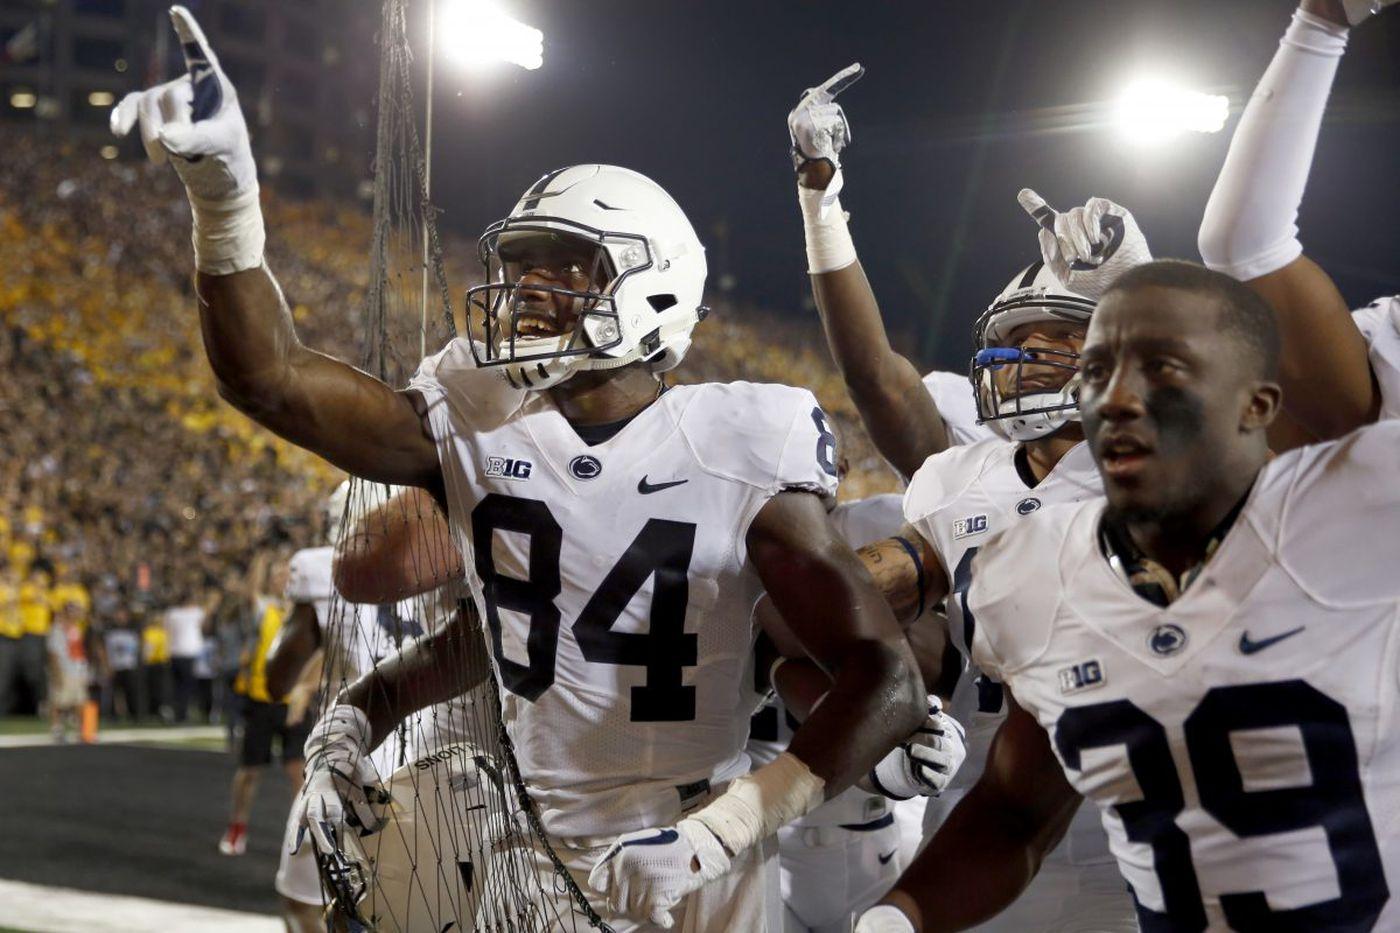 Penn State's Trace McSorley, Juwan Johnson score walkoff touchdown in win at Iowa